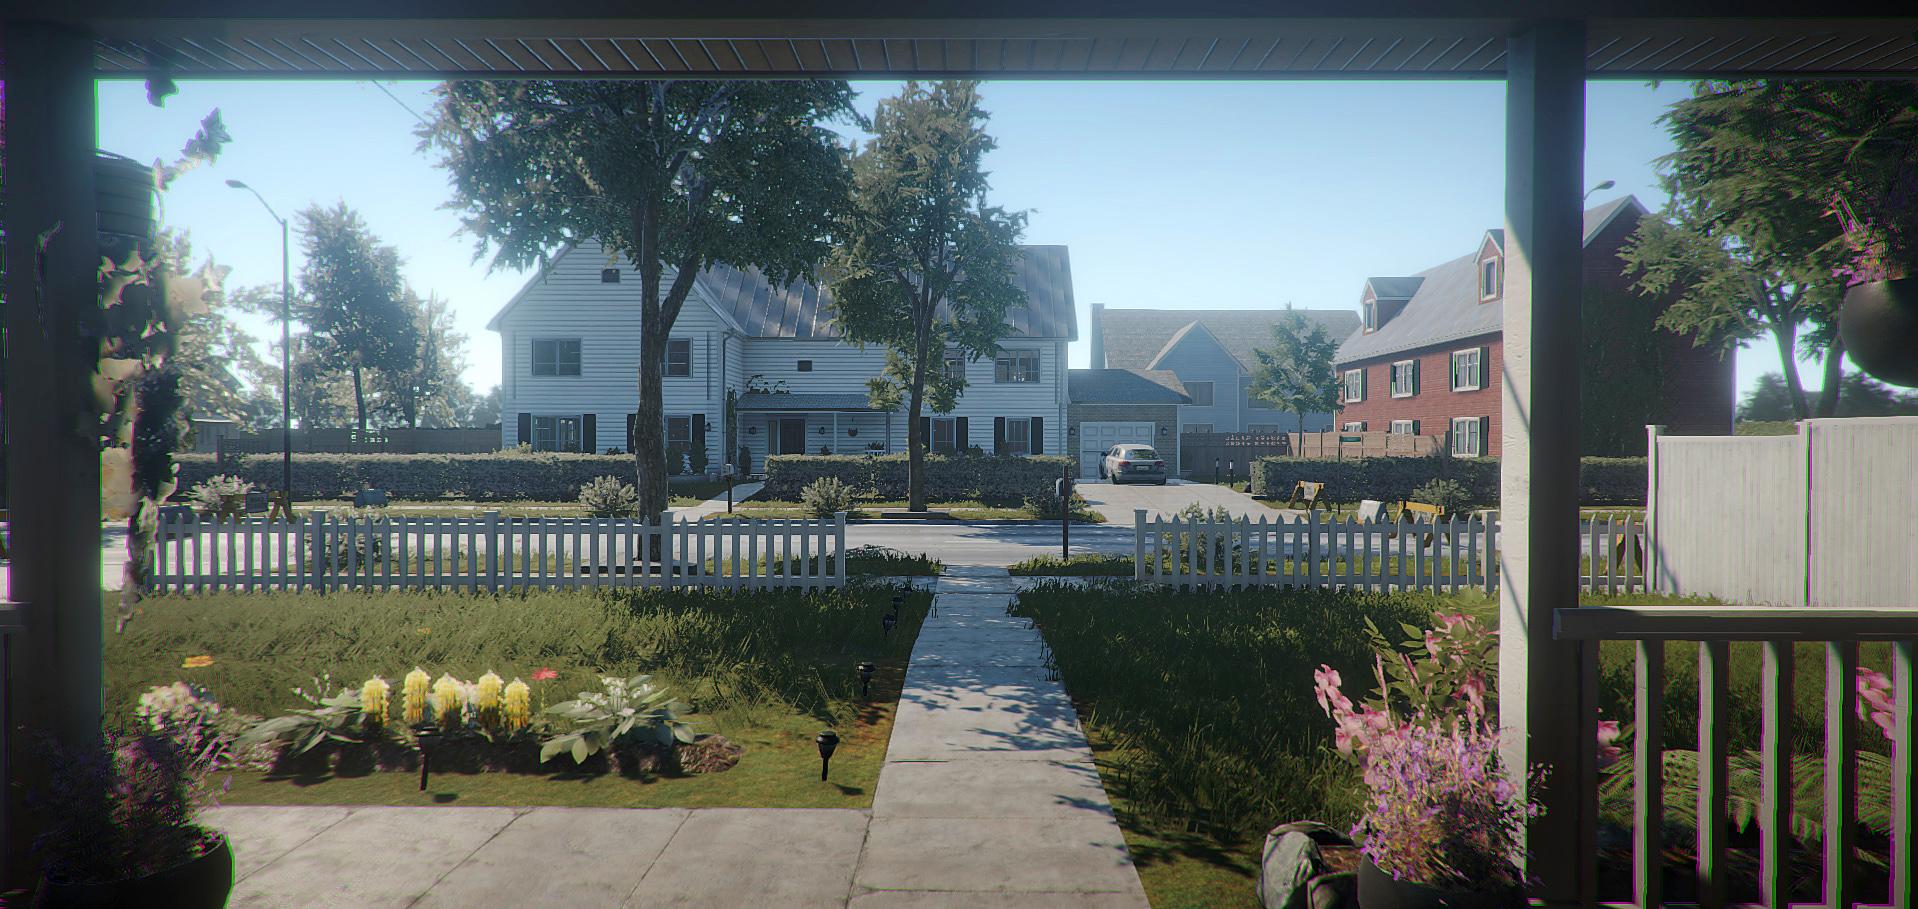 Suburb Neighborhood House Pack (Modular)